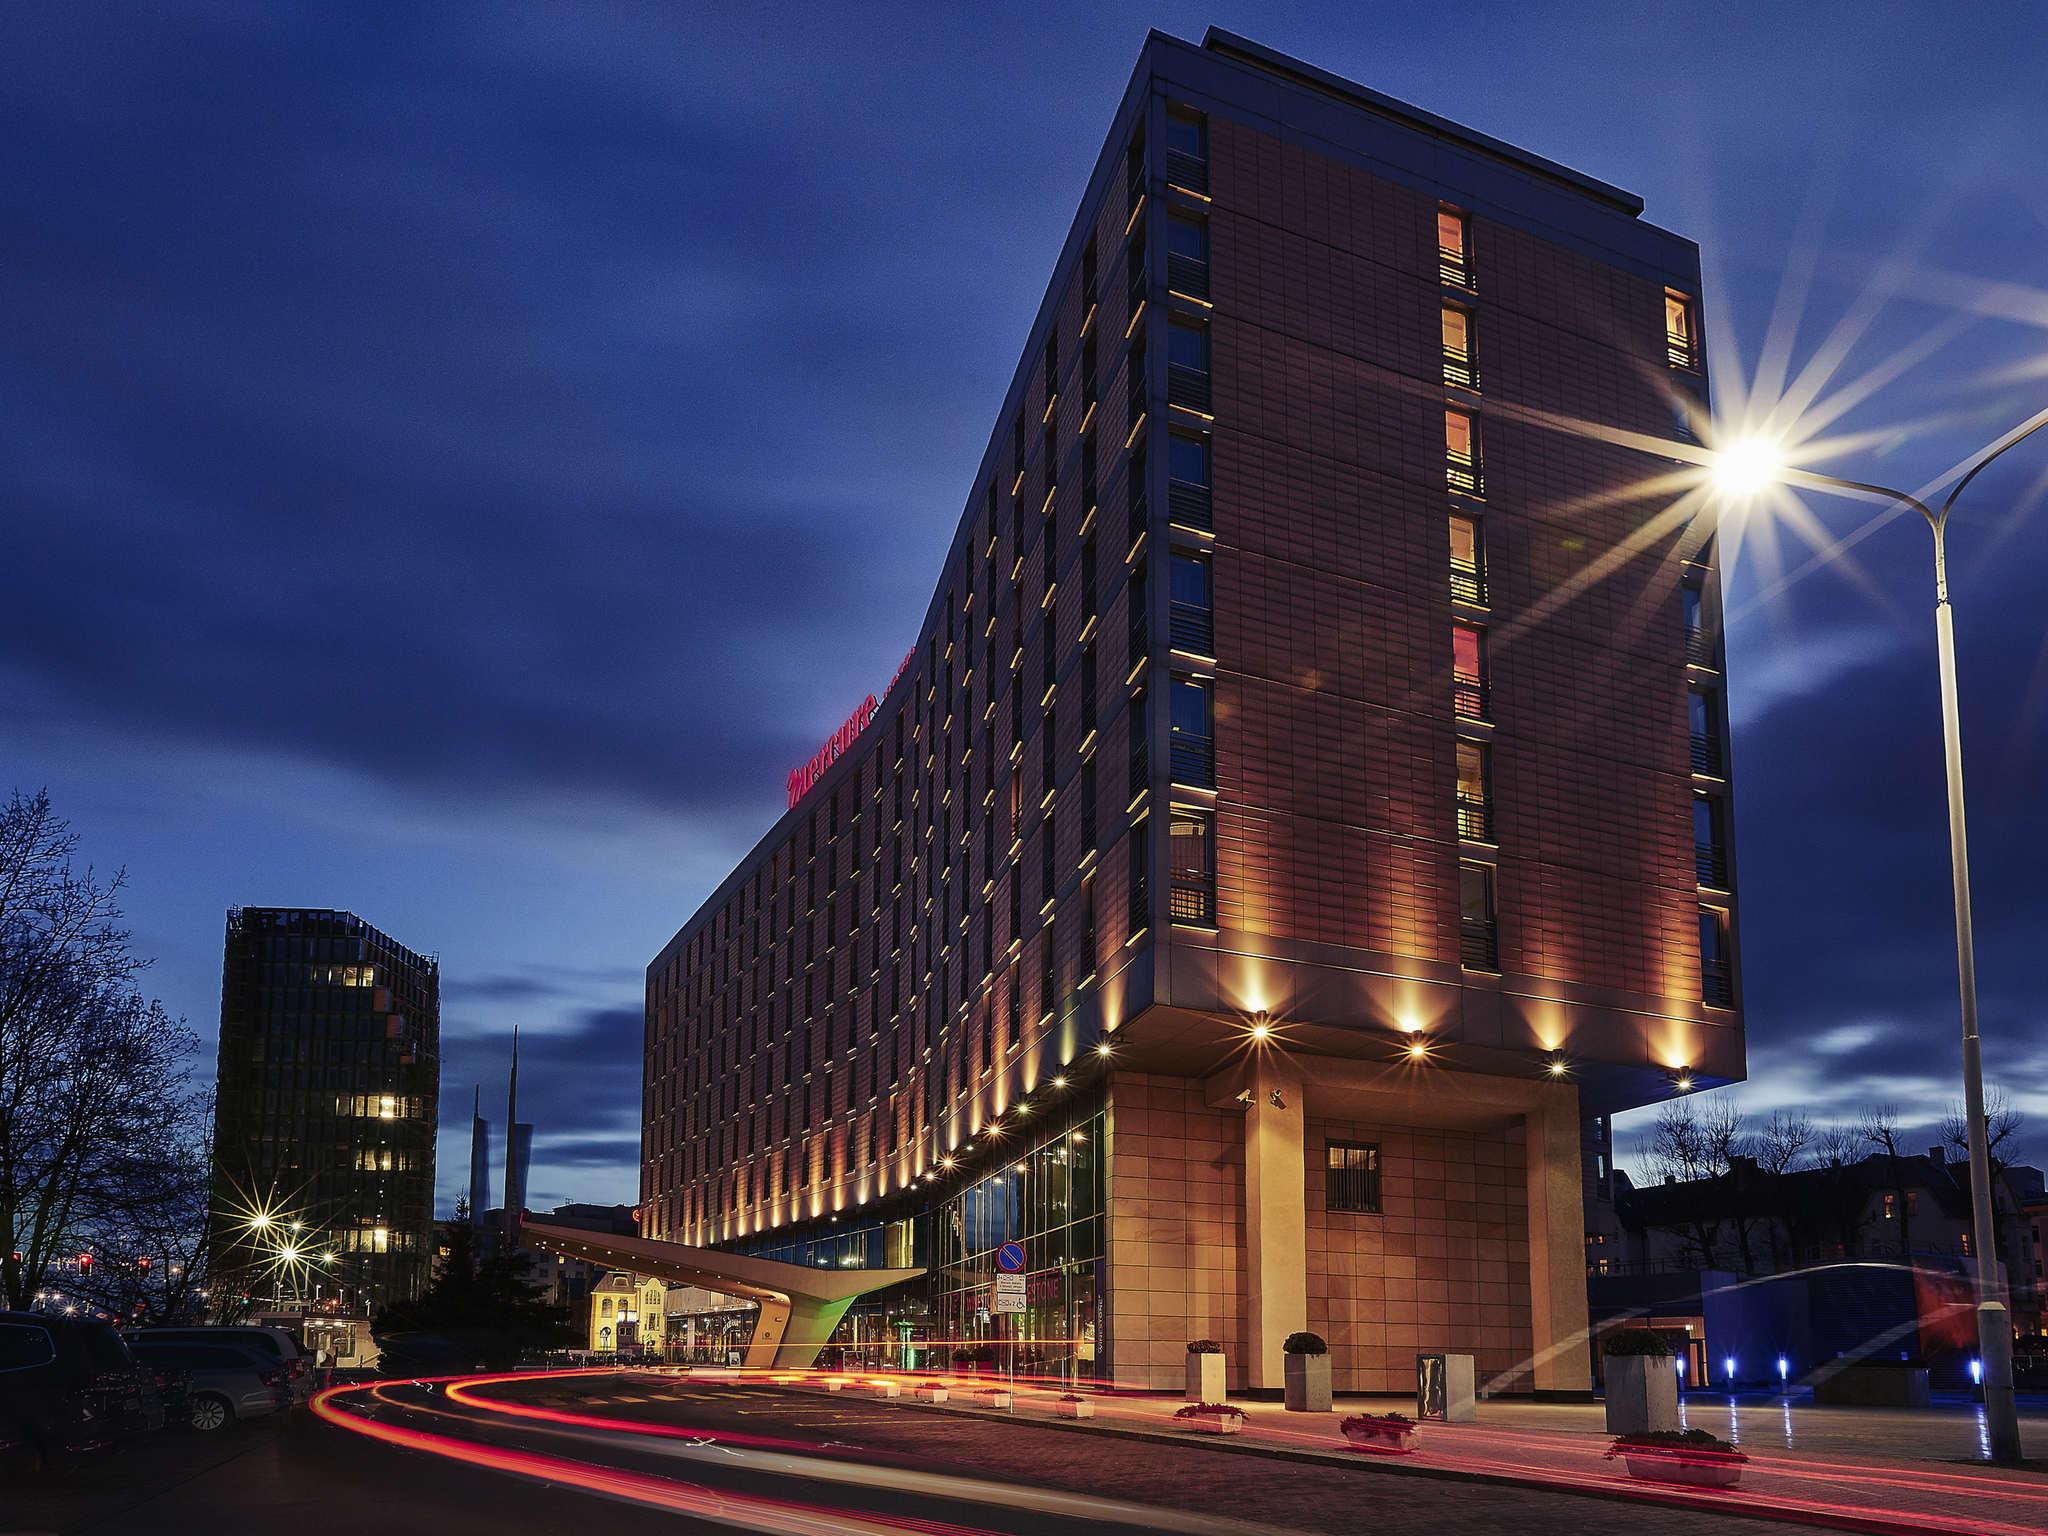 Hotel – Hotel Mercure Poznan Centrum